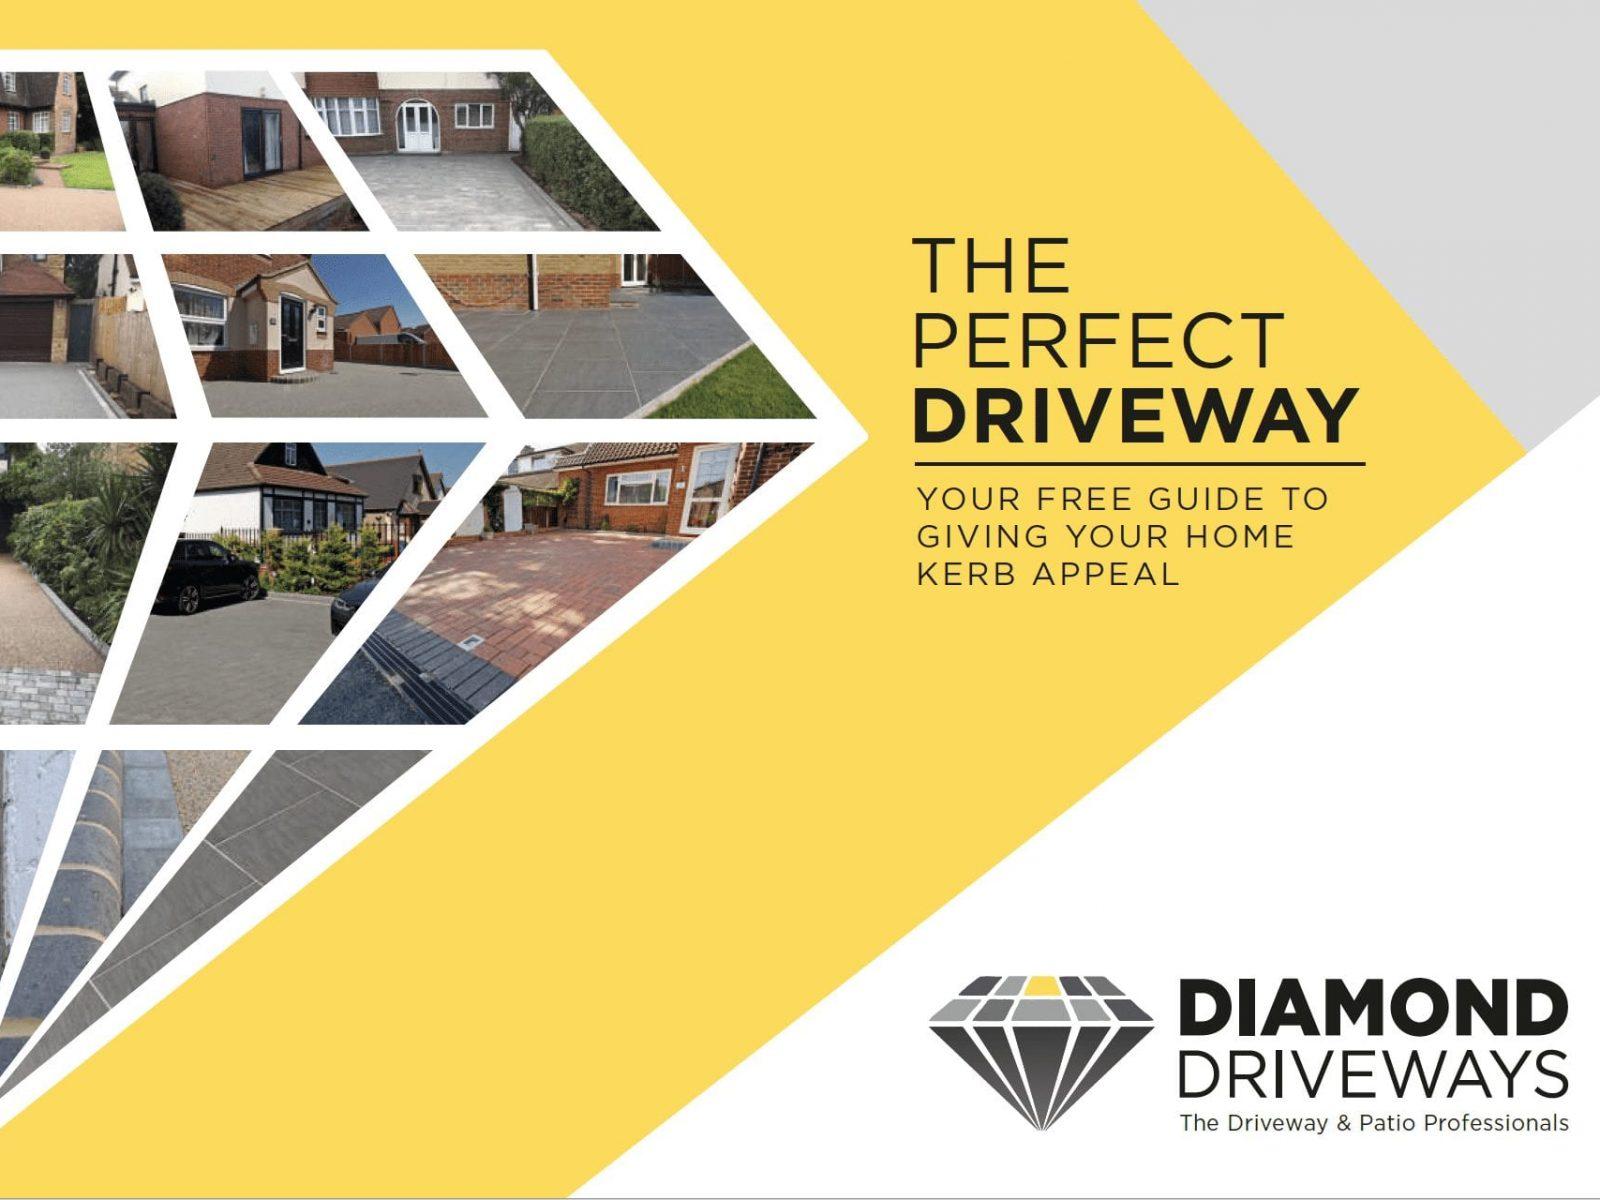 Diamond Driveways Guide to Driveways & driveway ideas